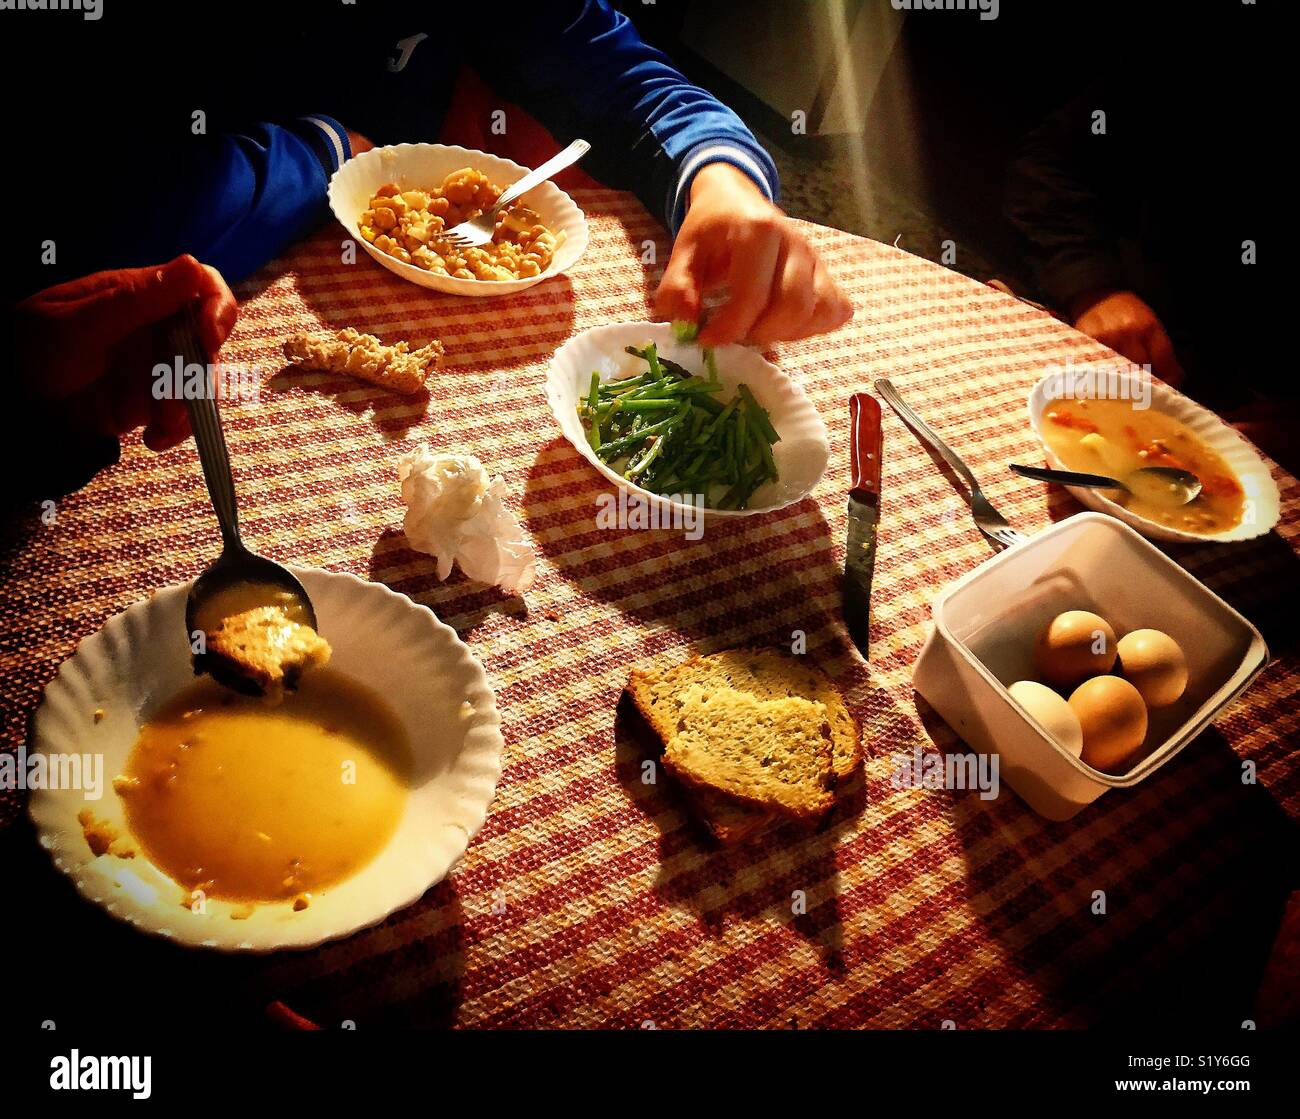 Les gens mangent dans un foyer en Prado del Rey, Cadix, Andalousie Photo Stock